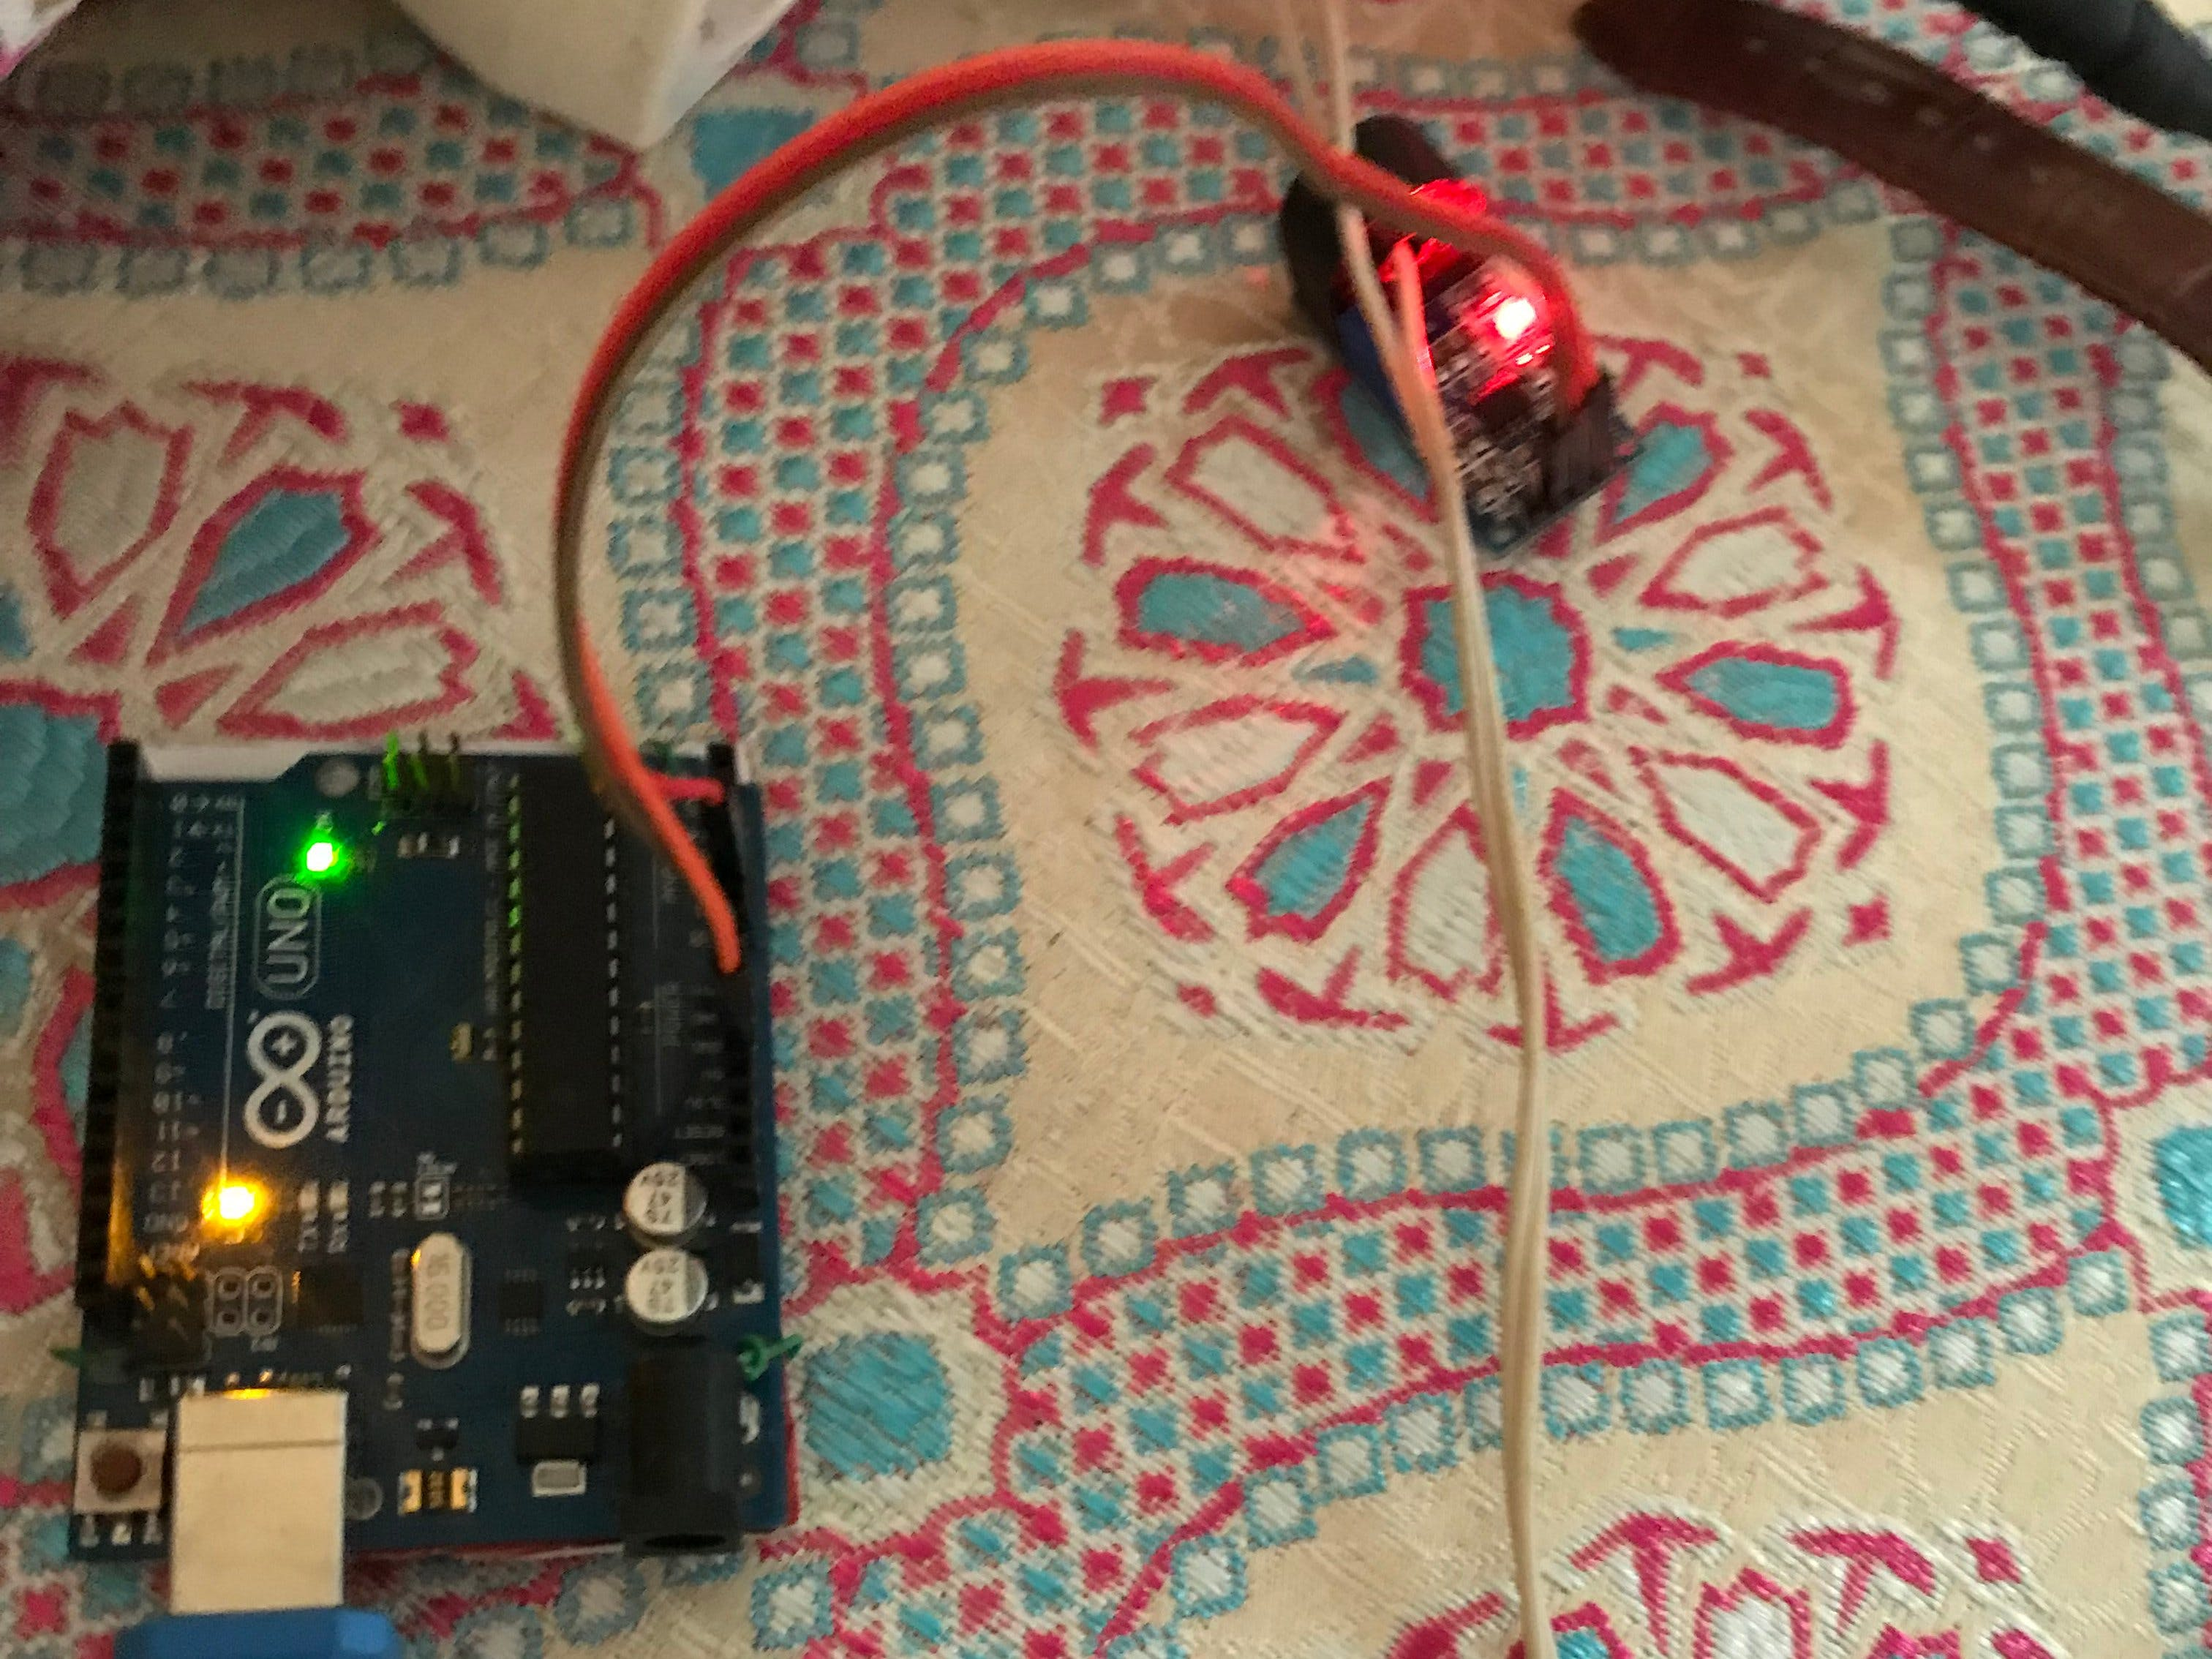 Balance World Inc 0-50A AC Current Module Detection Current Sensor Module for Arduino